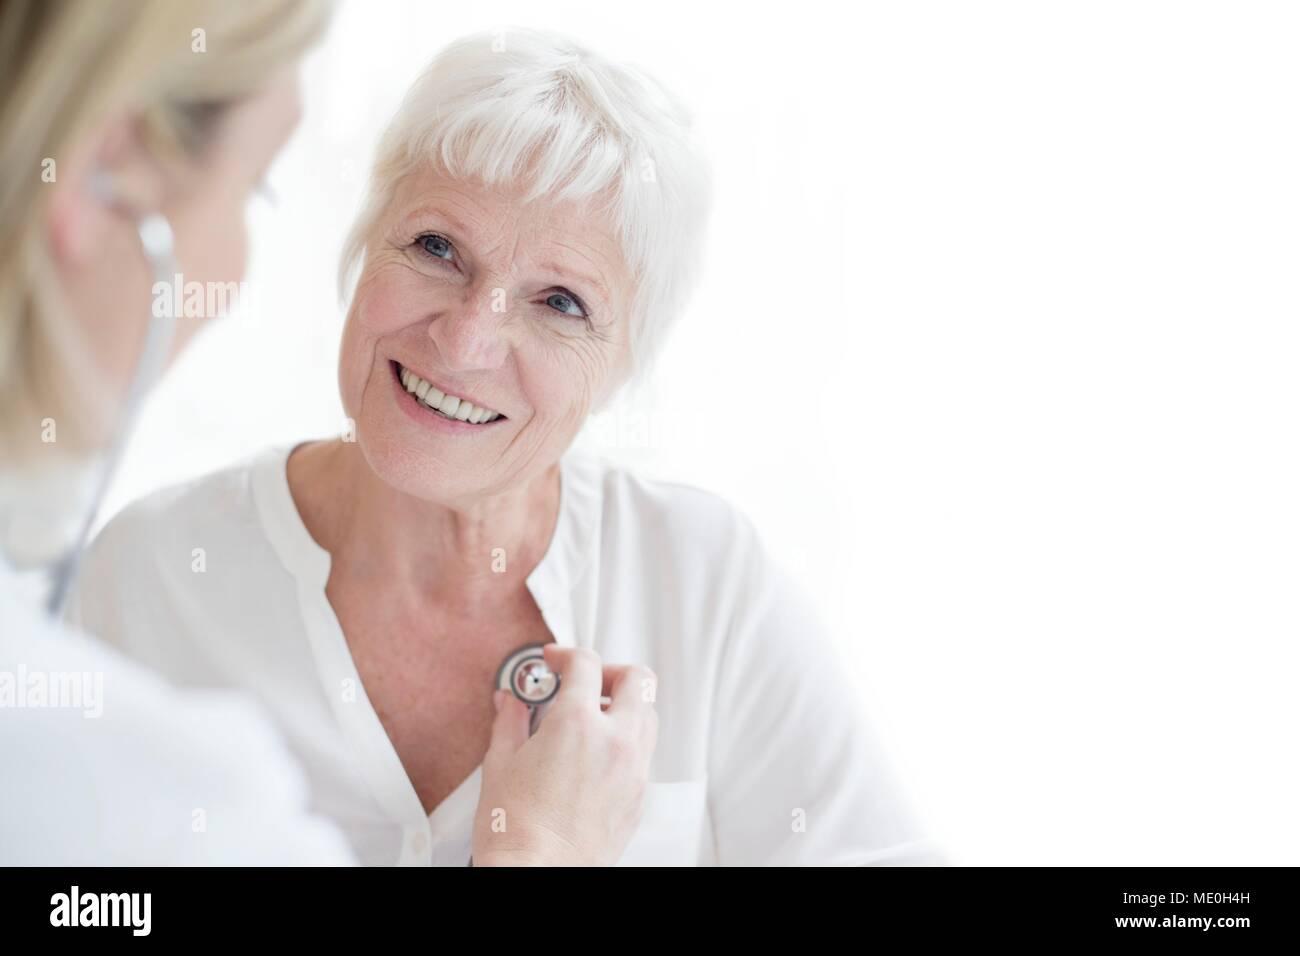 Female doctor examining senior woman. - Stock Image